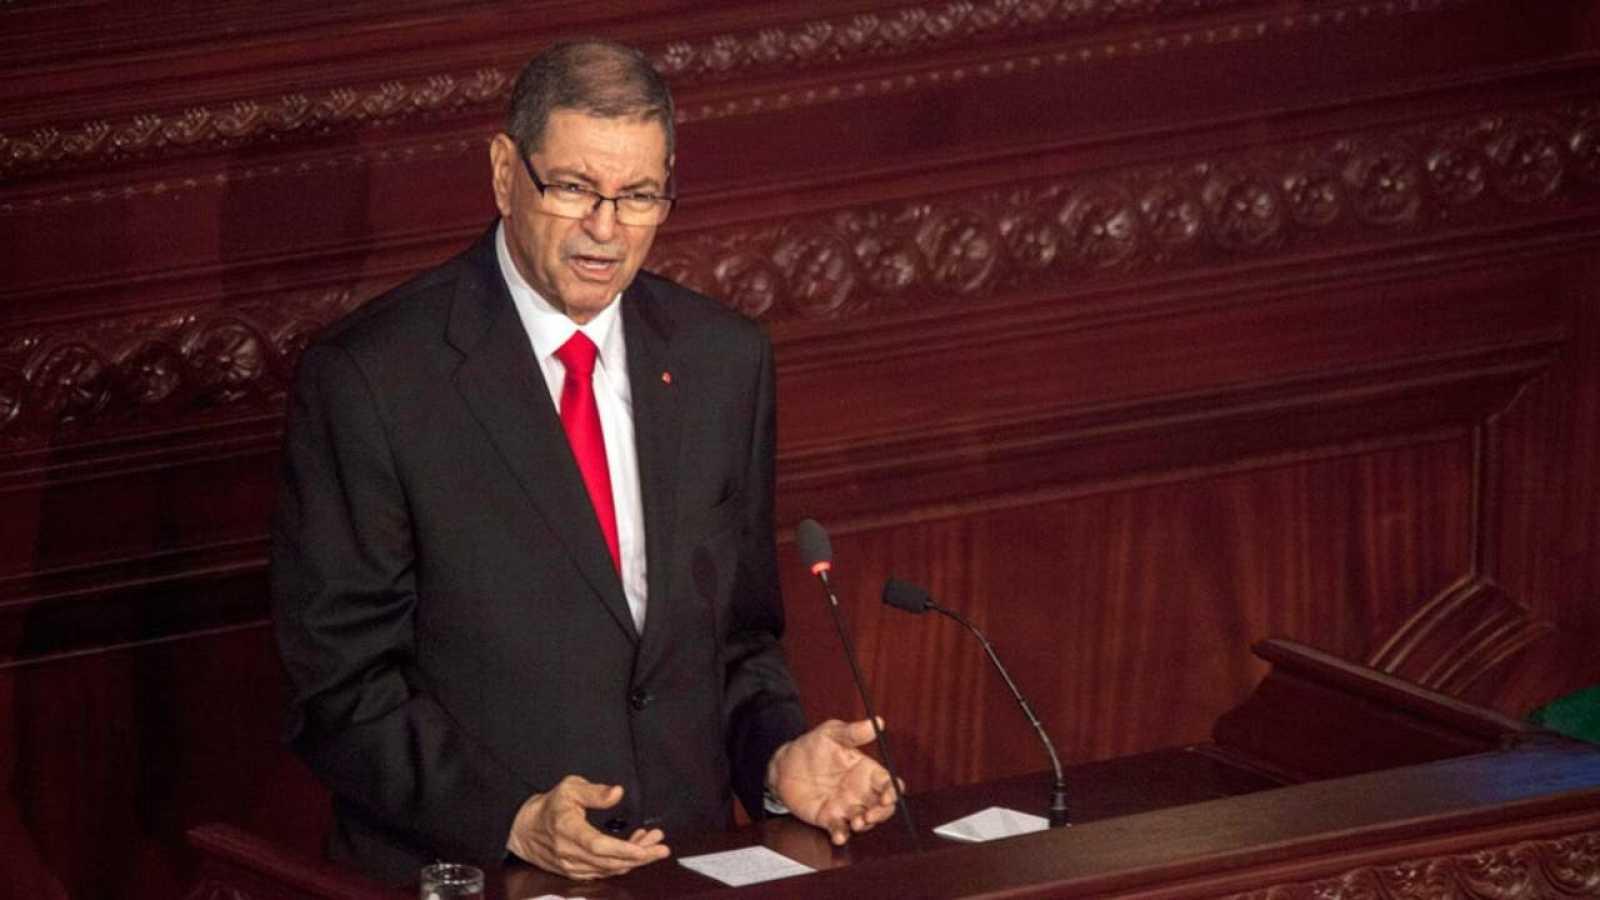 El primer ministro de Tunez destituido, Habib Essid